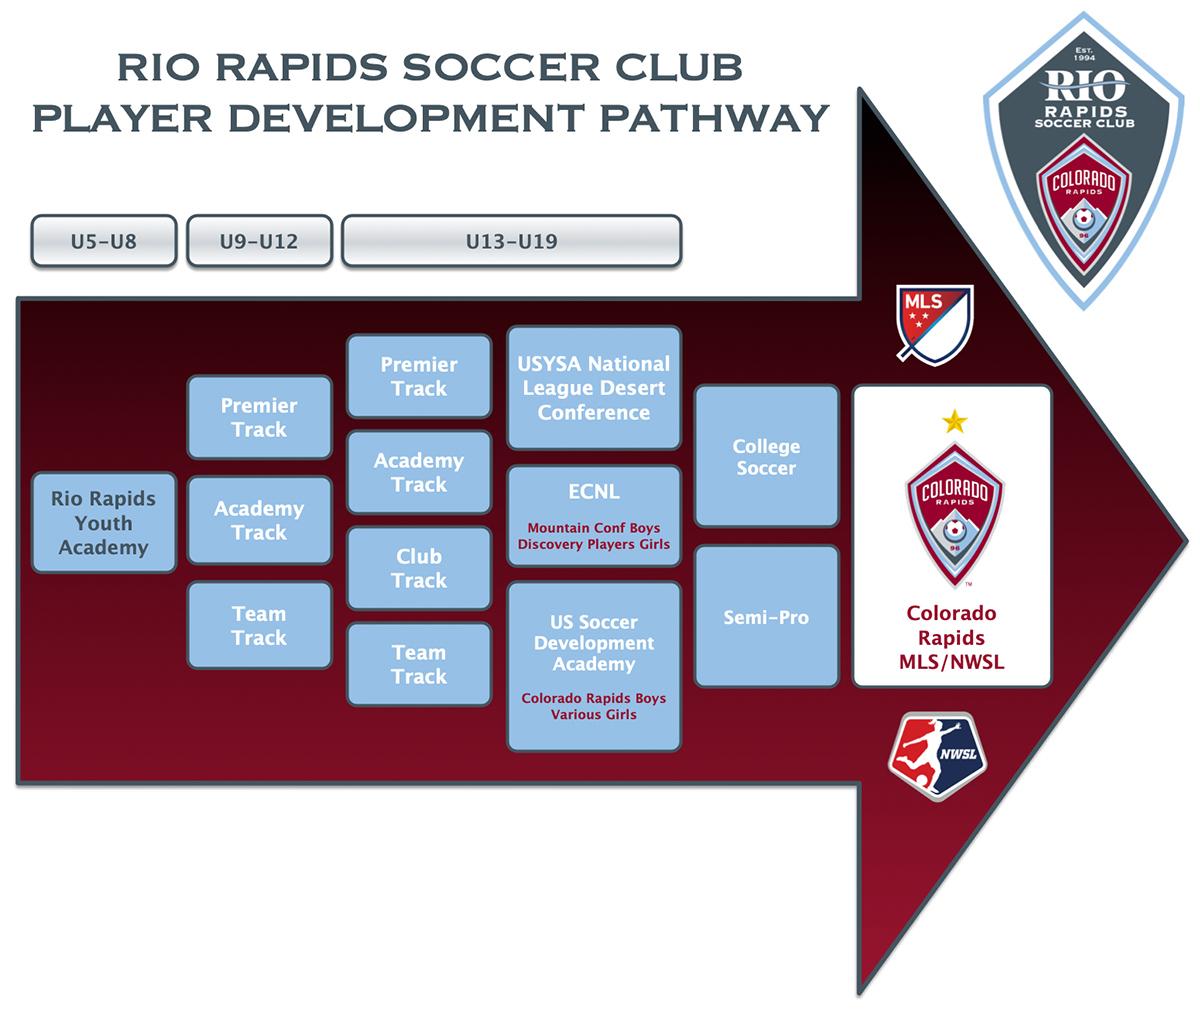 Rrsc programs pathway 080618